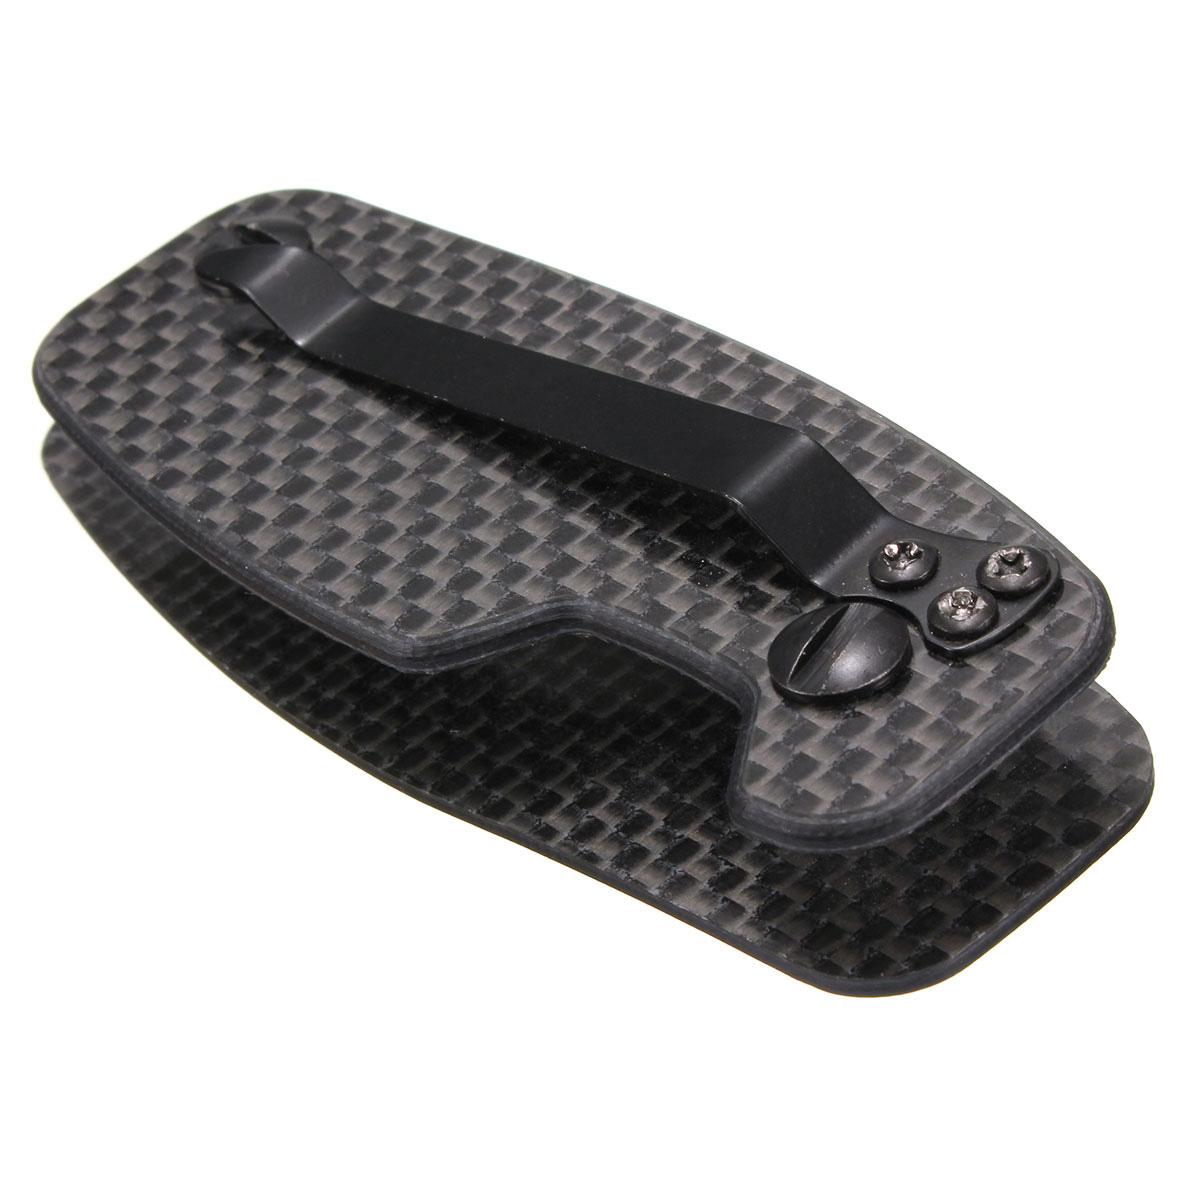 Nike Gloves Key Pocket: EDC Carbon Fiber FoldingKey Lightweight Pocket Key Clip